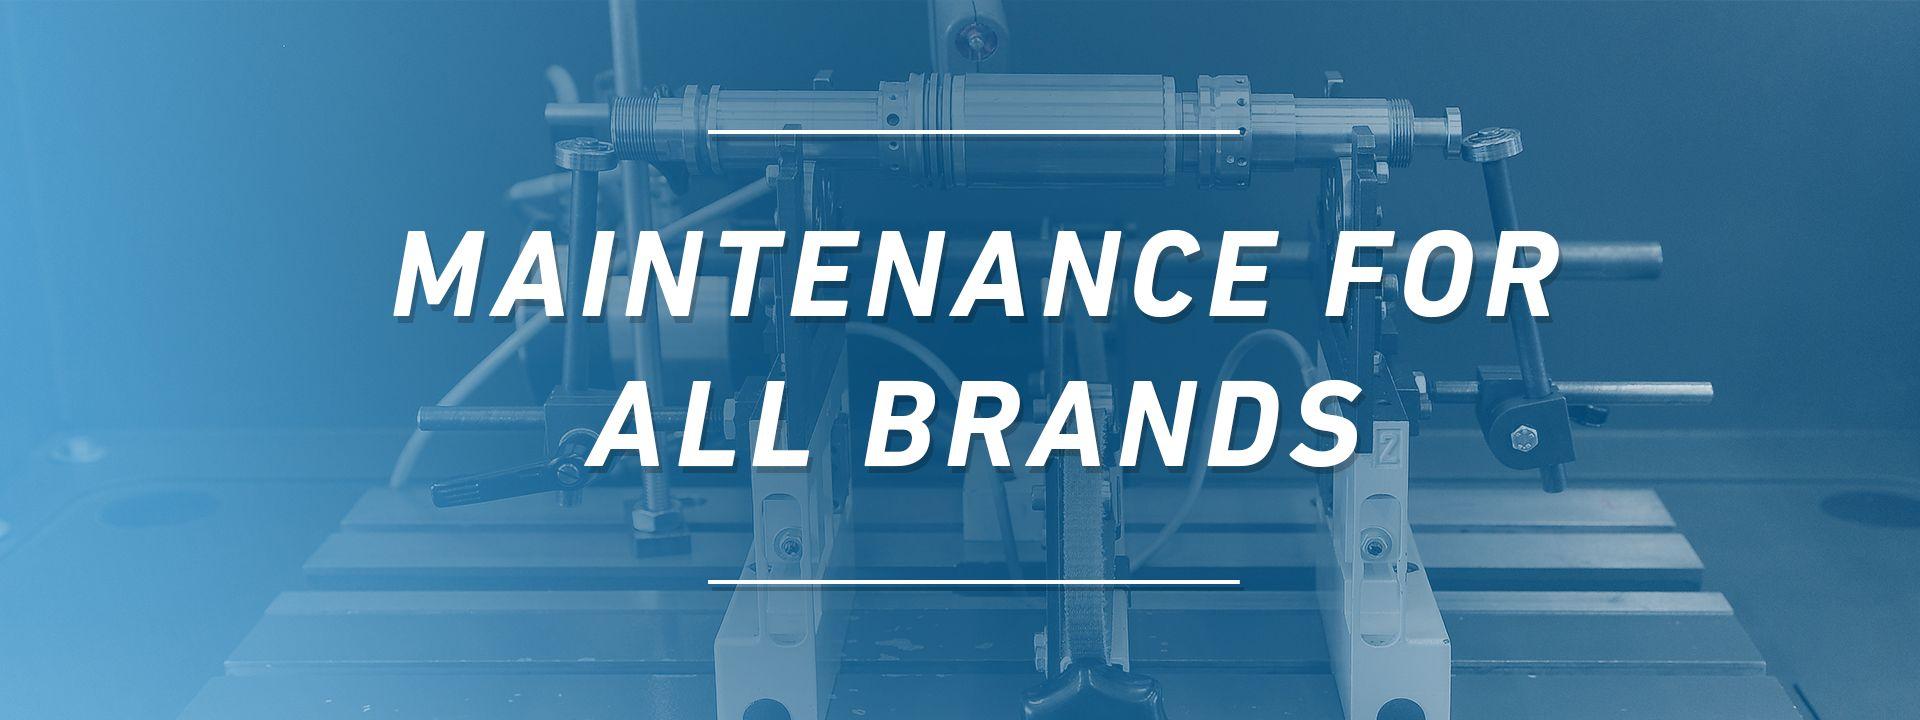 Precise France - Maintenance All Brands